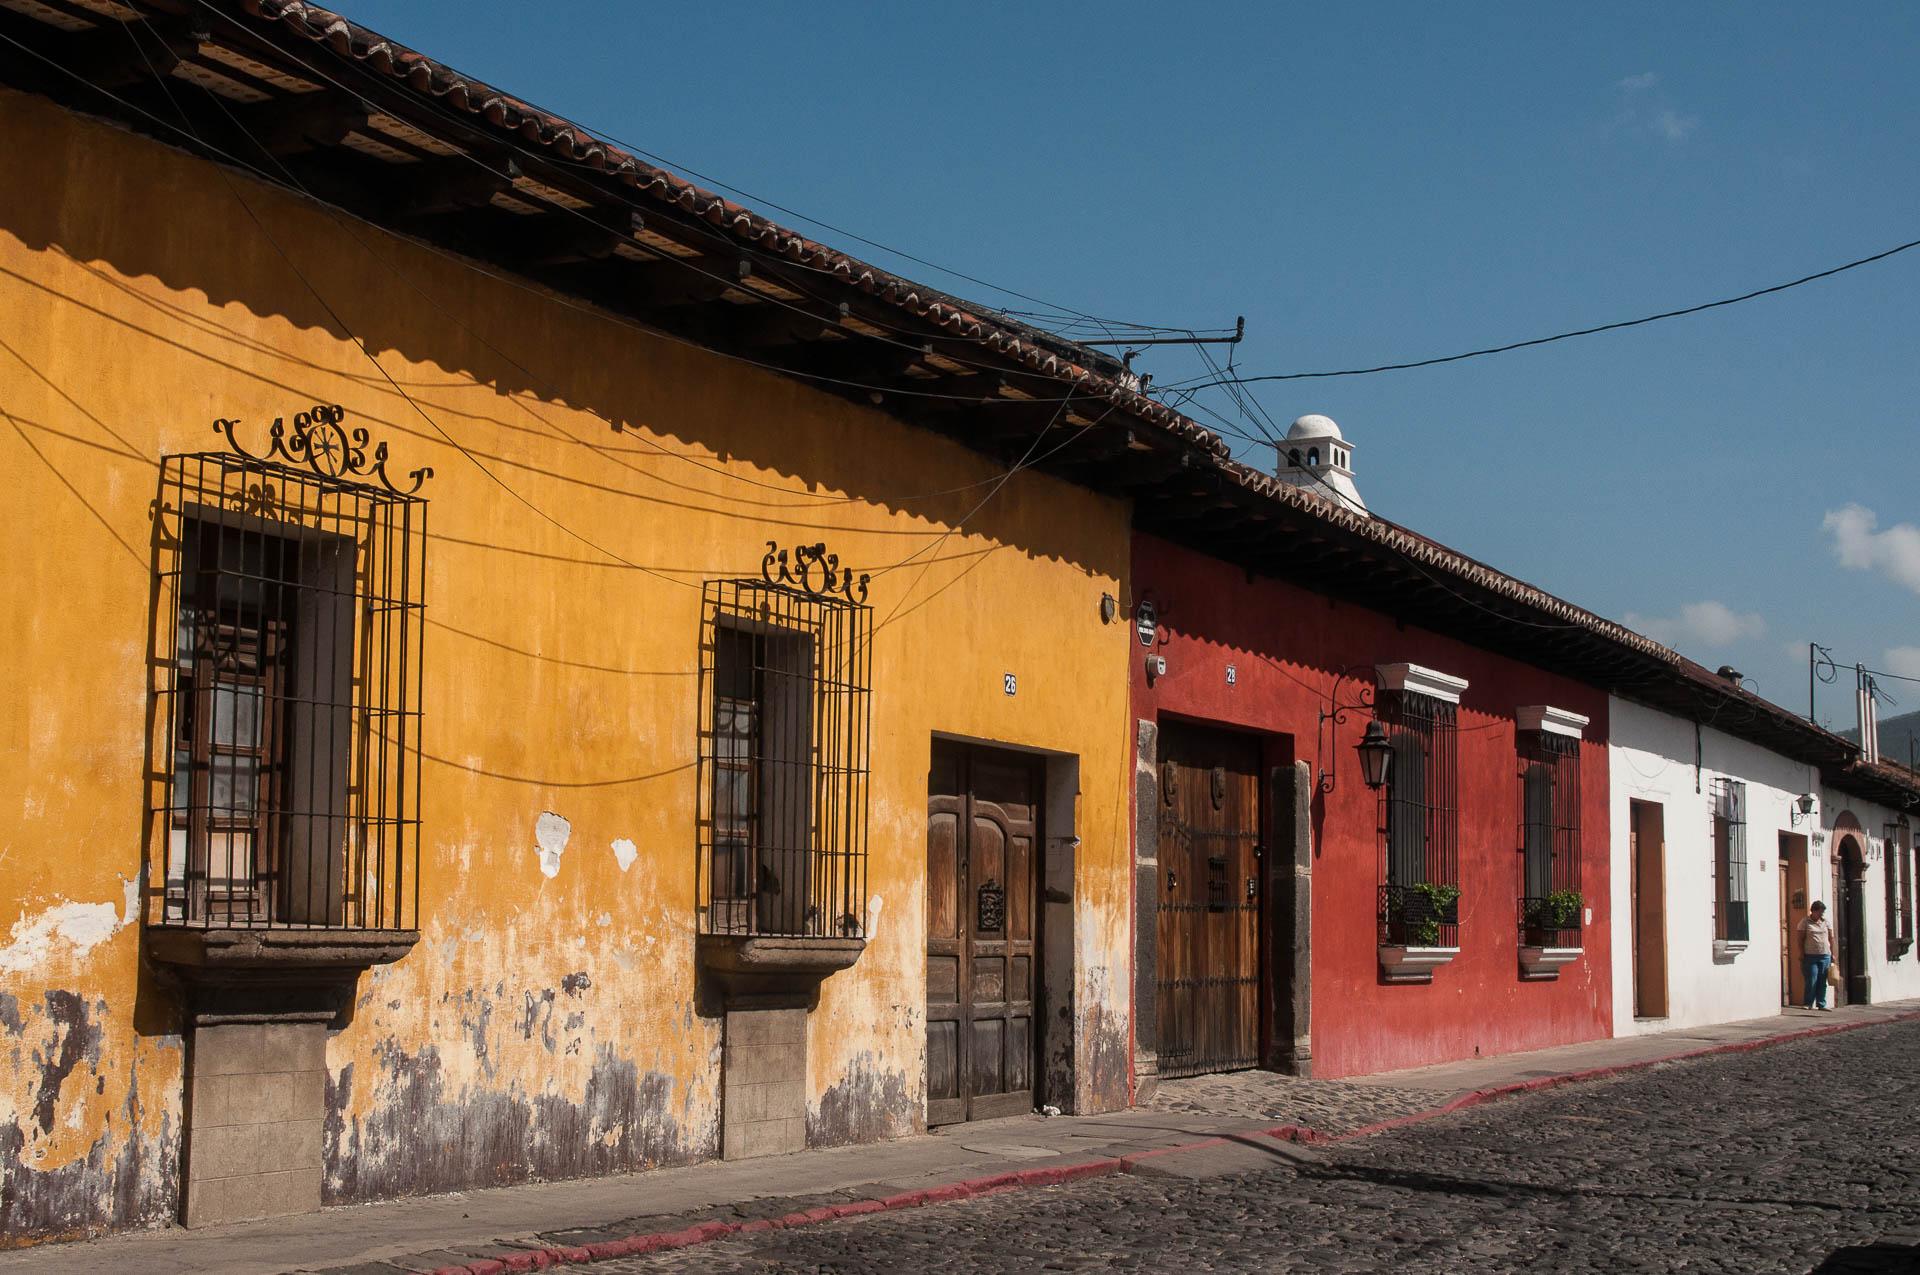 Antigua façade colorée